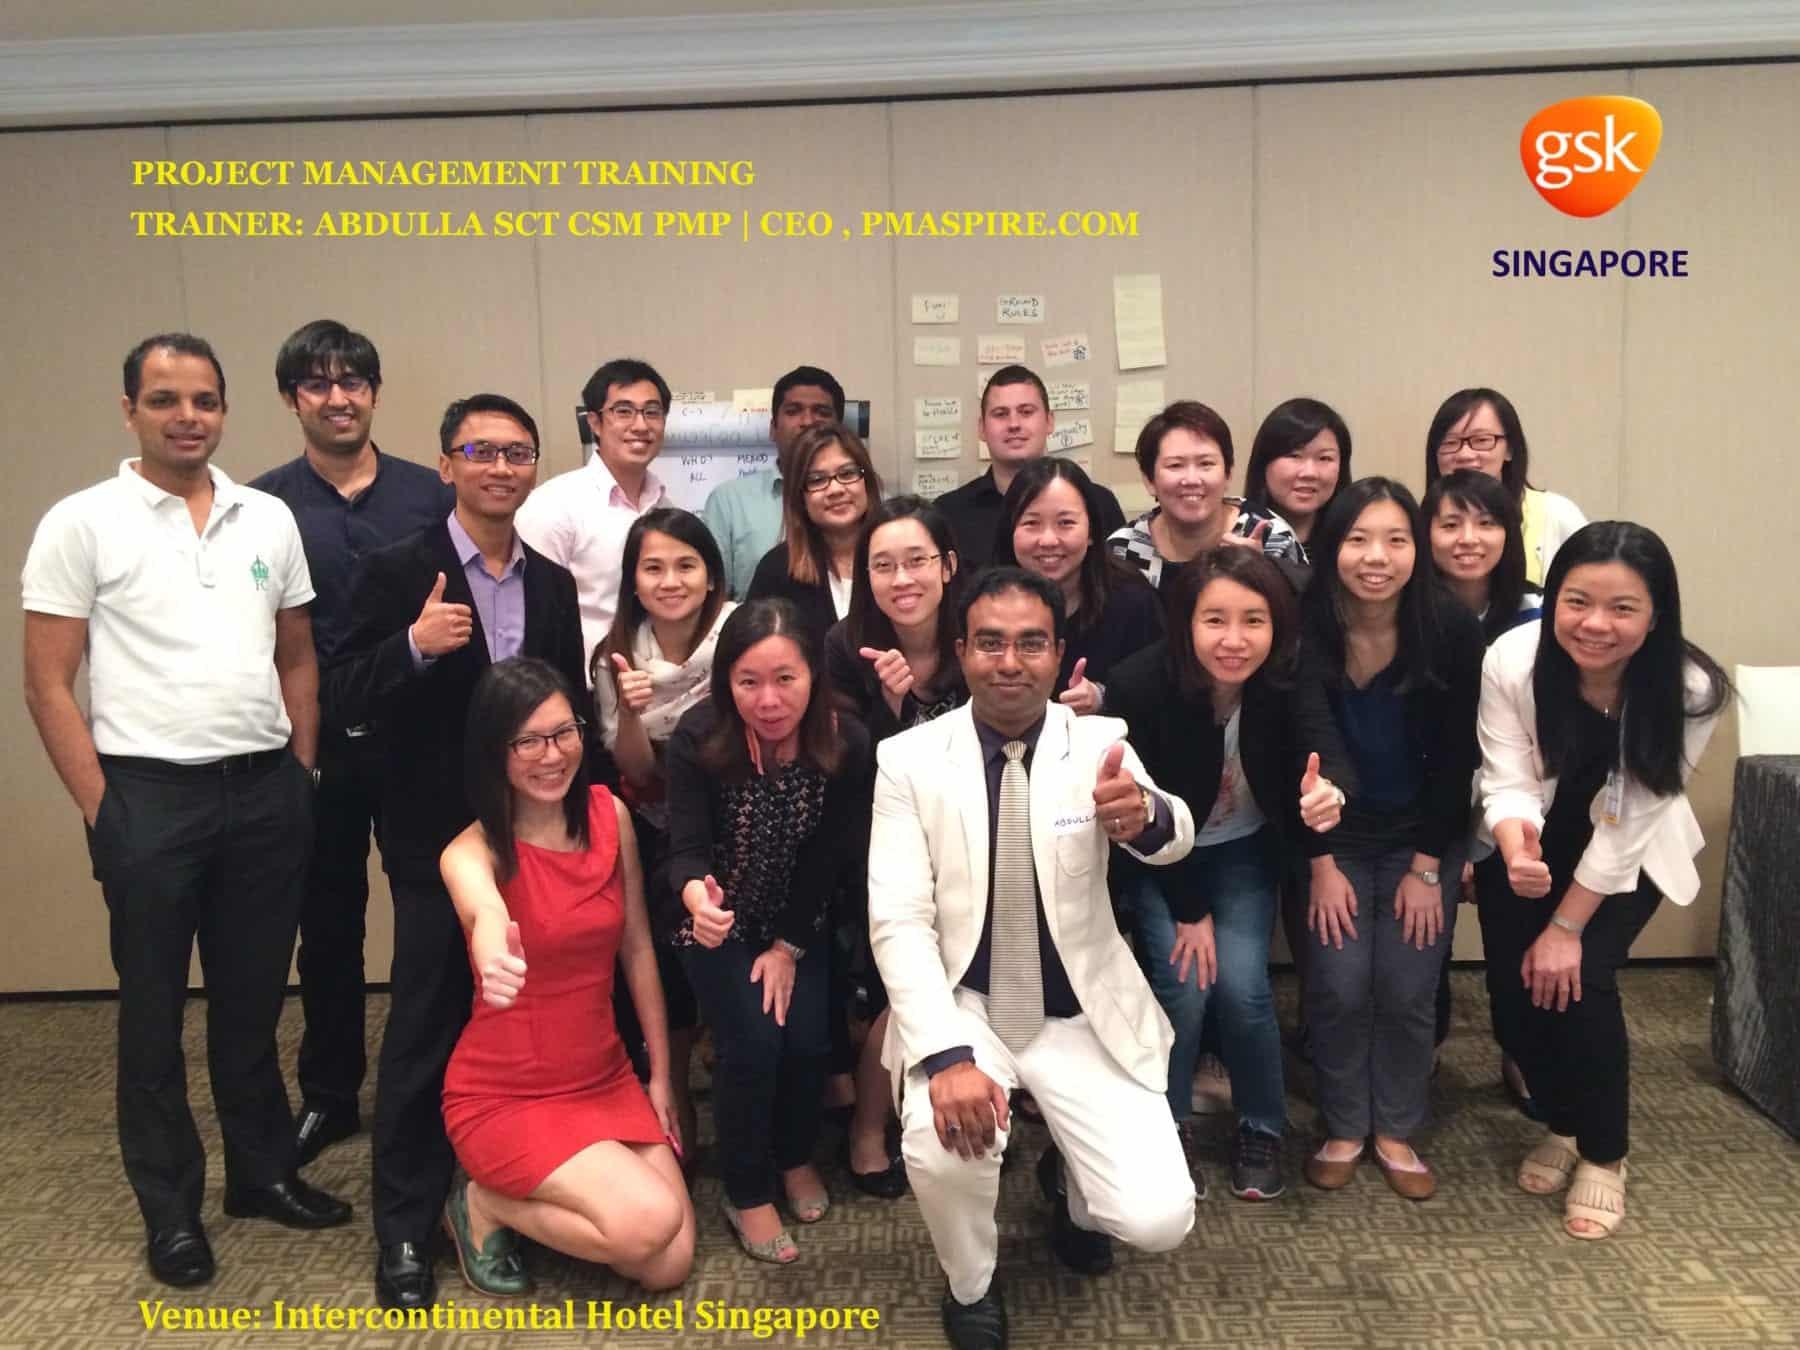 pmaspire_project_management_training_singapore